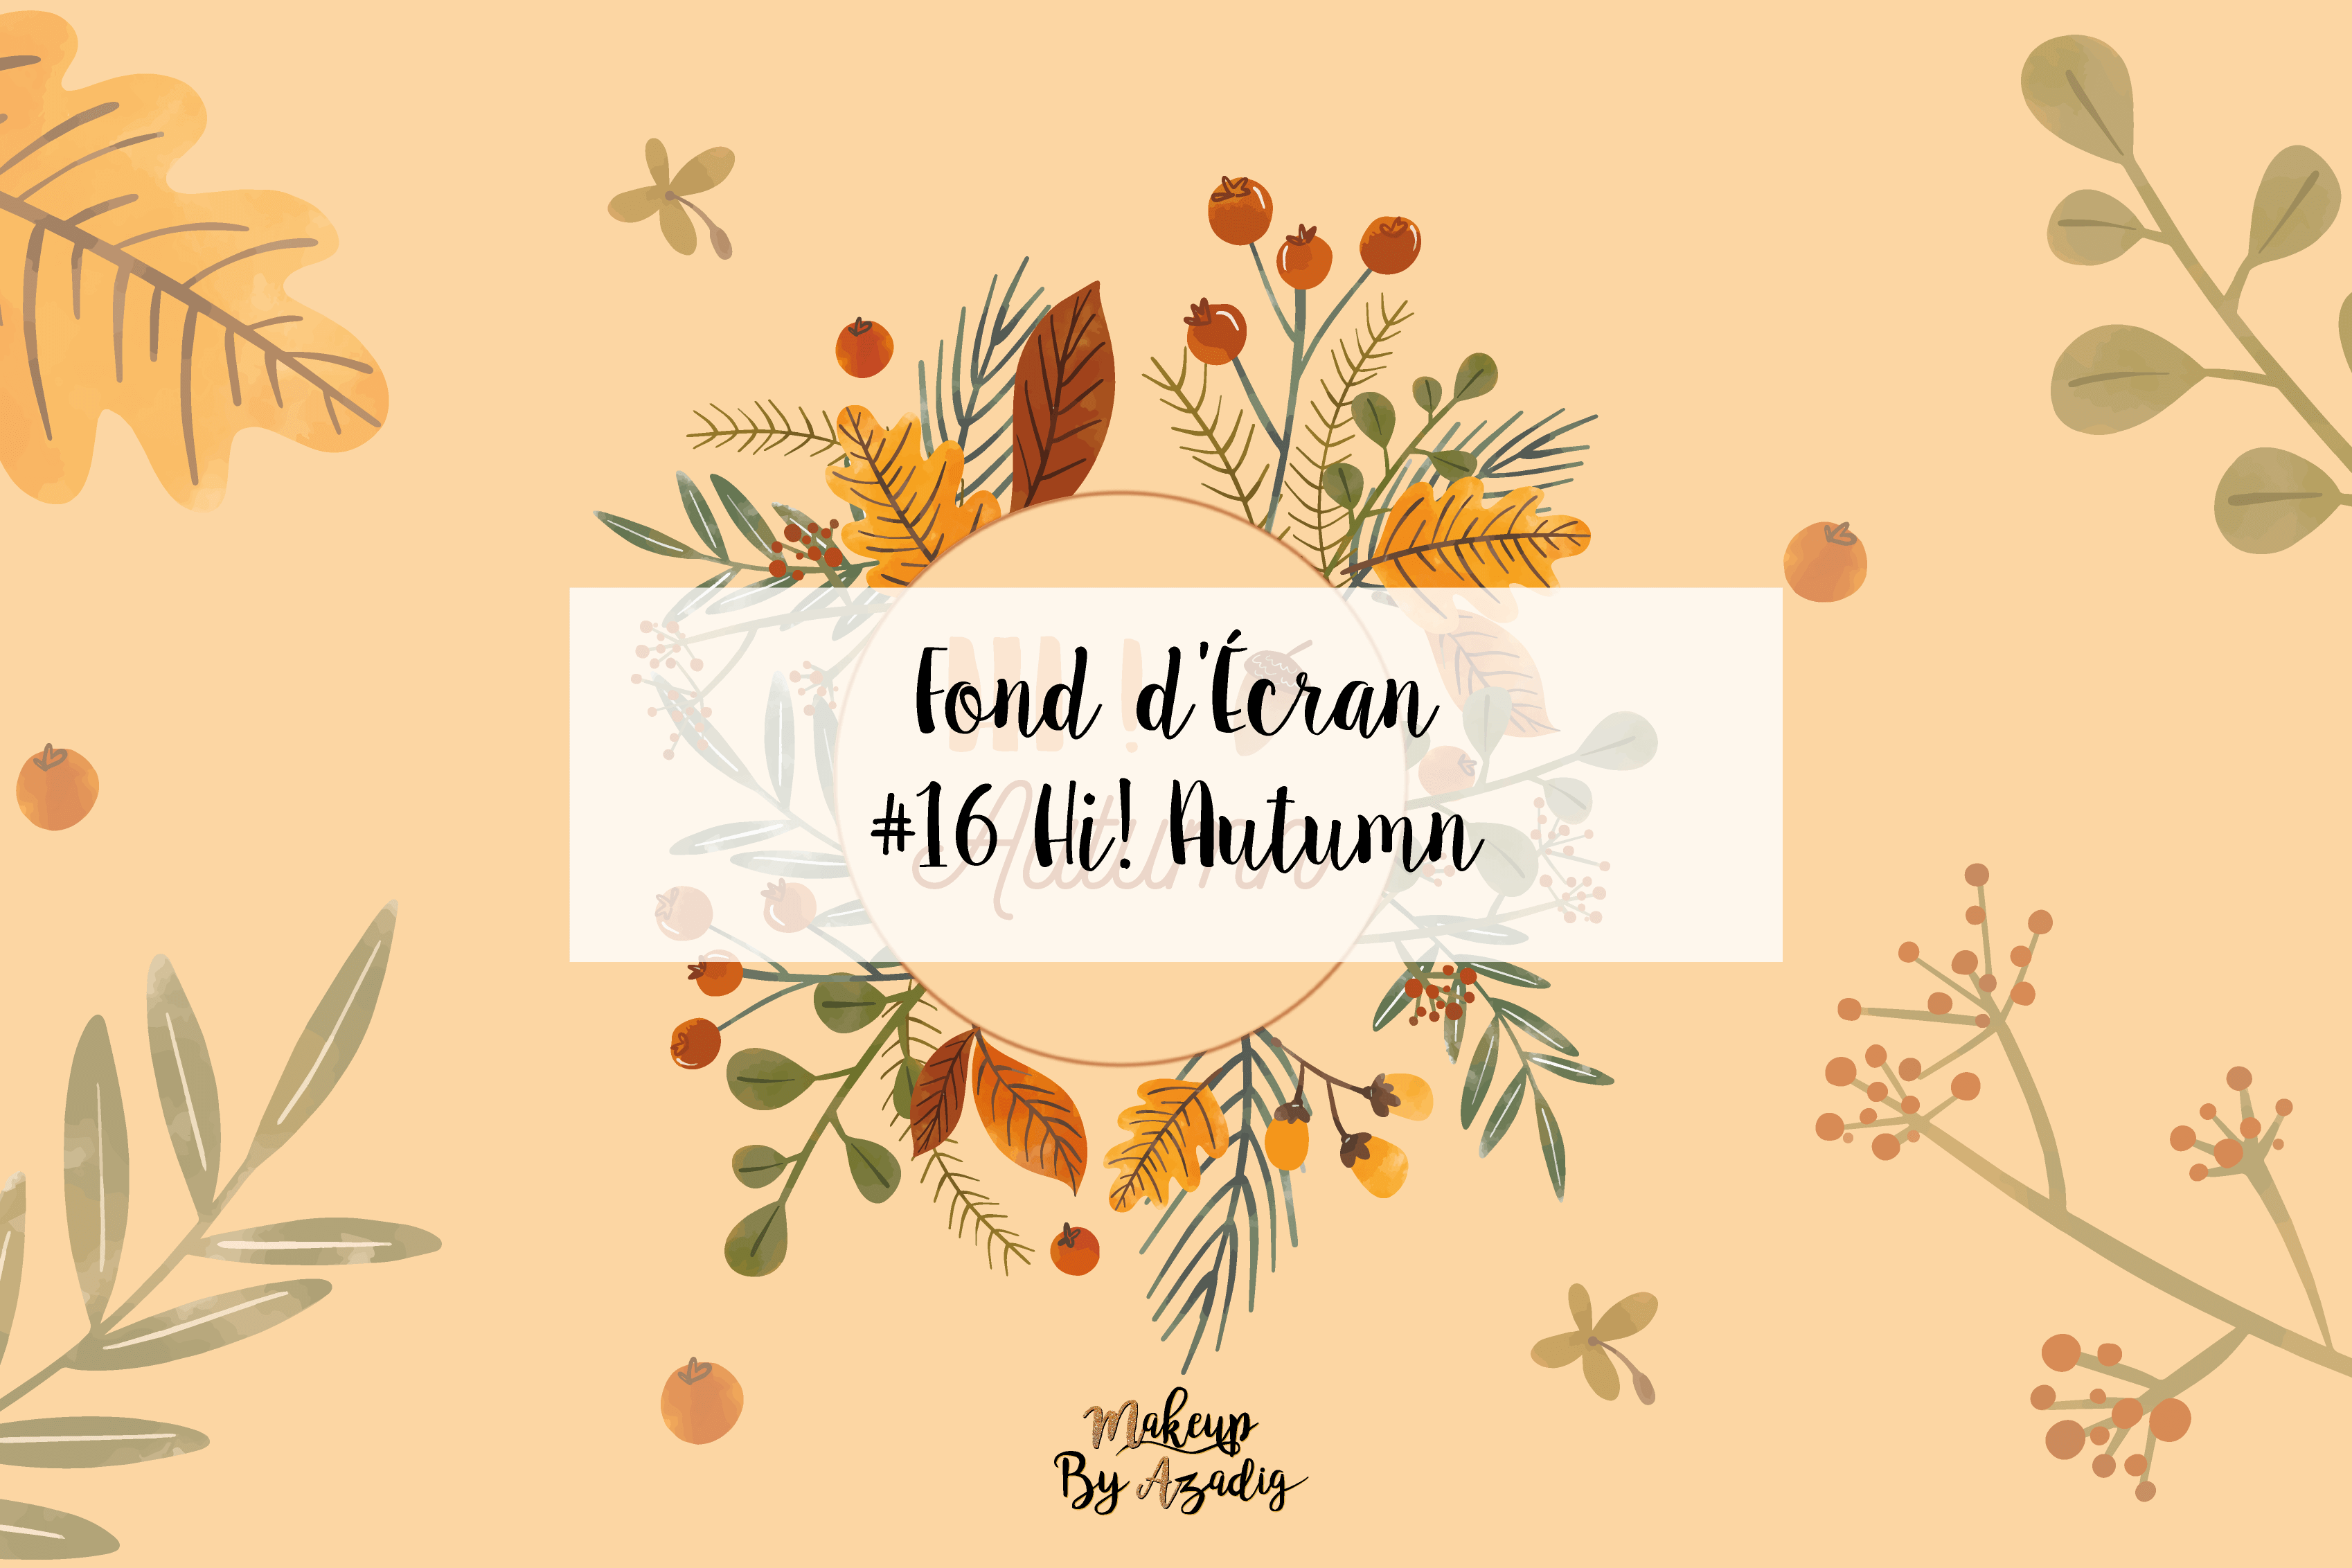 fond-decran-wallpaper-automne-leaves-autumn-girly-ordinateur-iphone-samsung-mac-macbook-imac-pc-makeupbyazadig-miniature